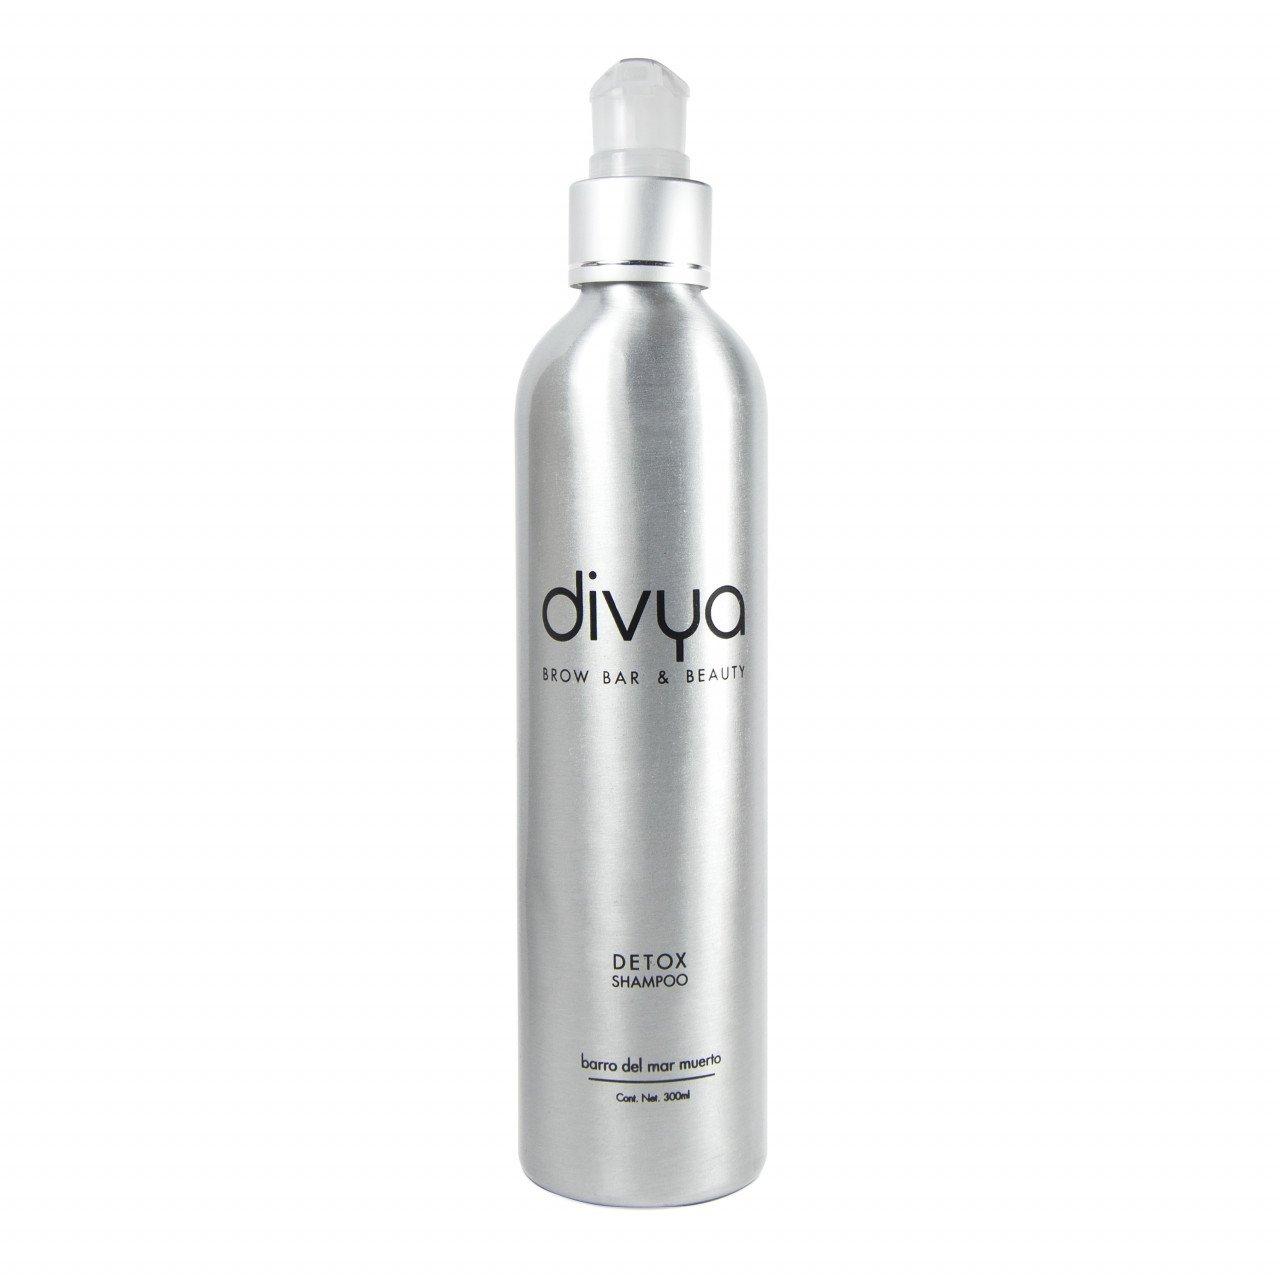 Shampoo Detox&w=900&h=900&fit=crop